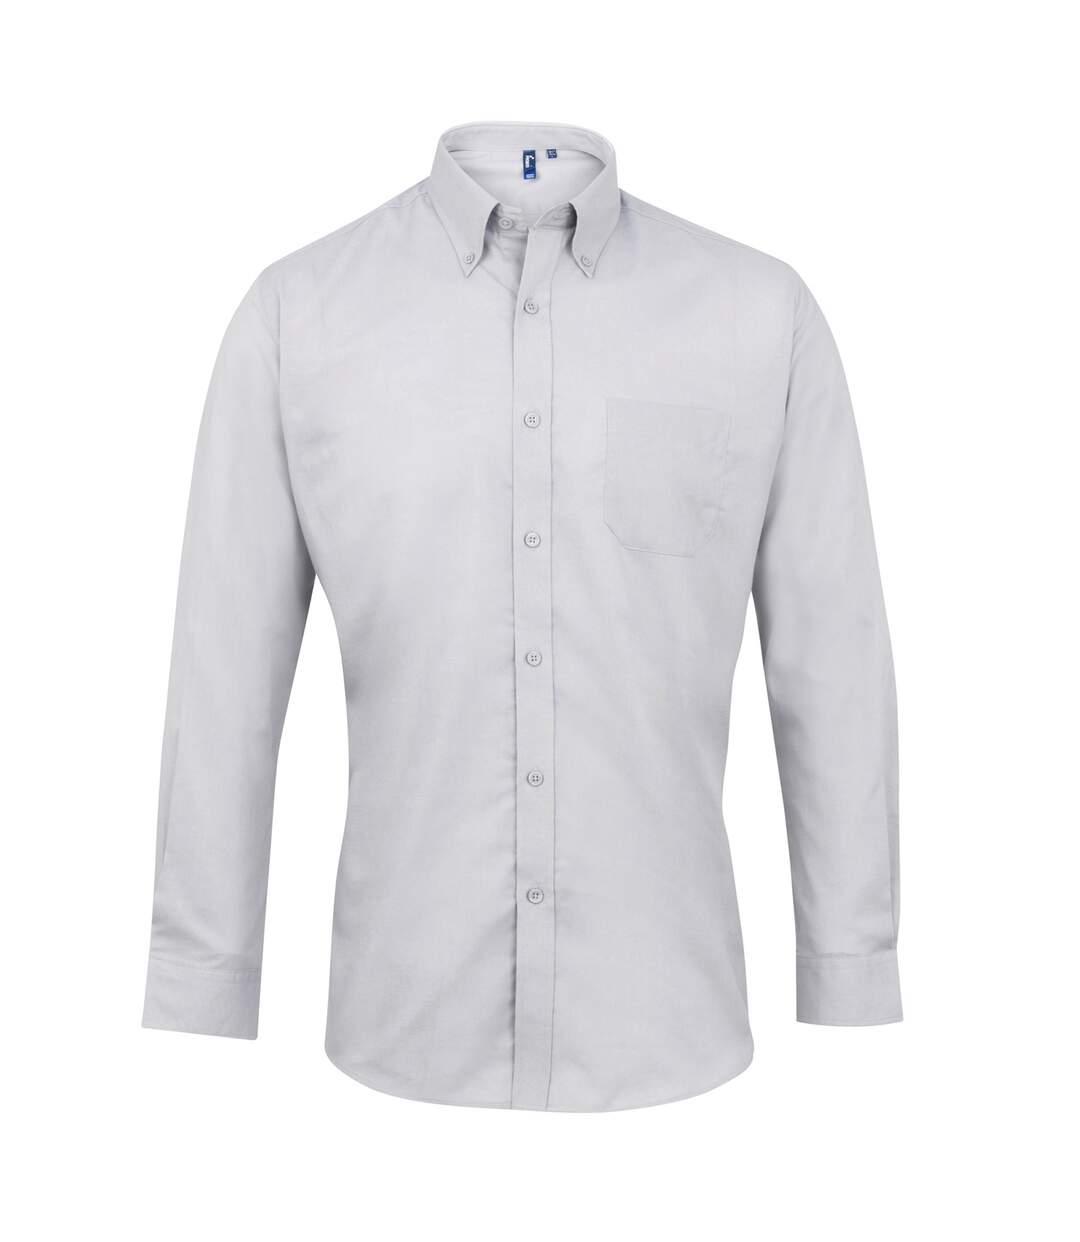 Premier Mens Signature Oxford Long Sleeve Work Shirt (Silver) - UTRW2816